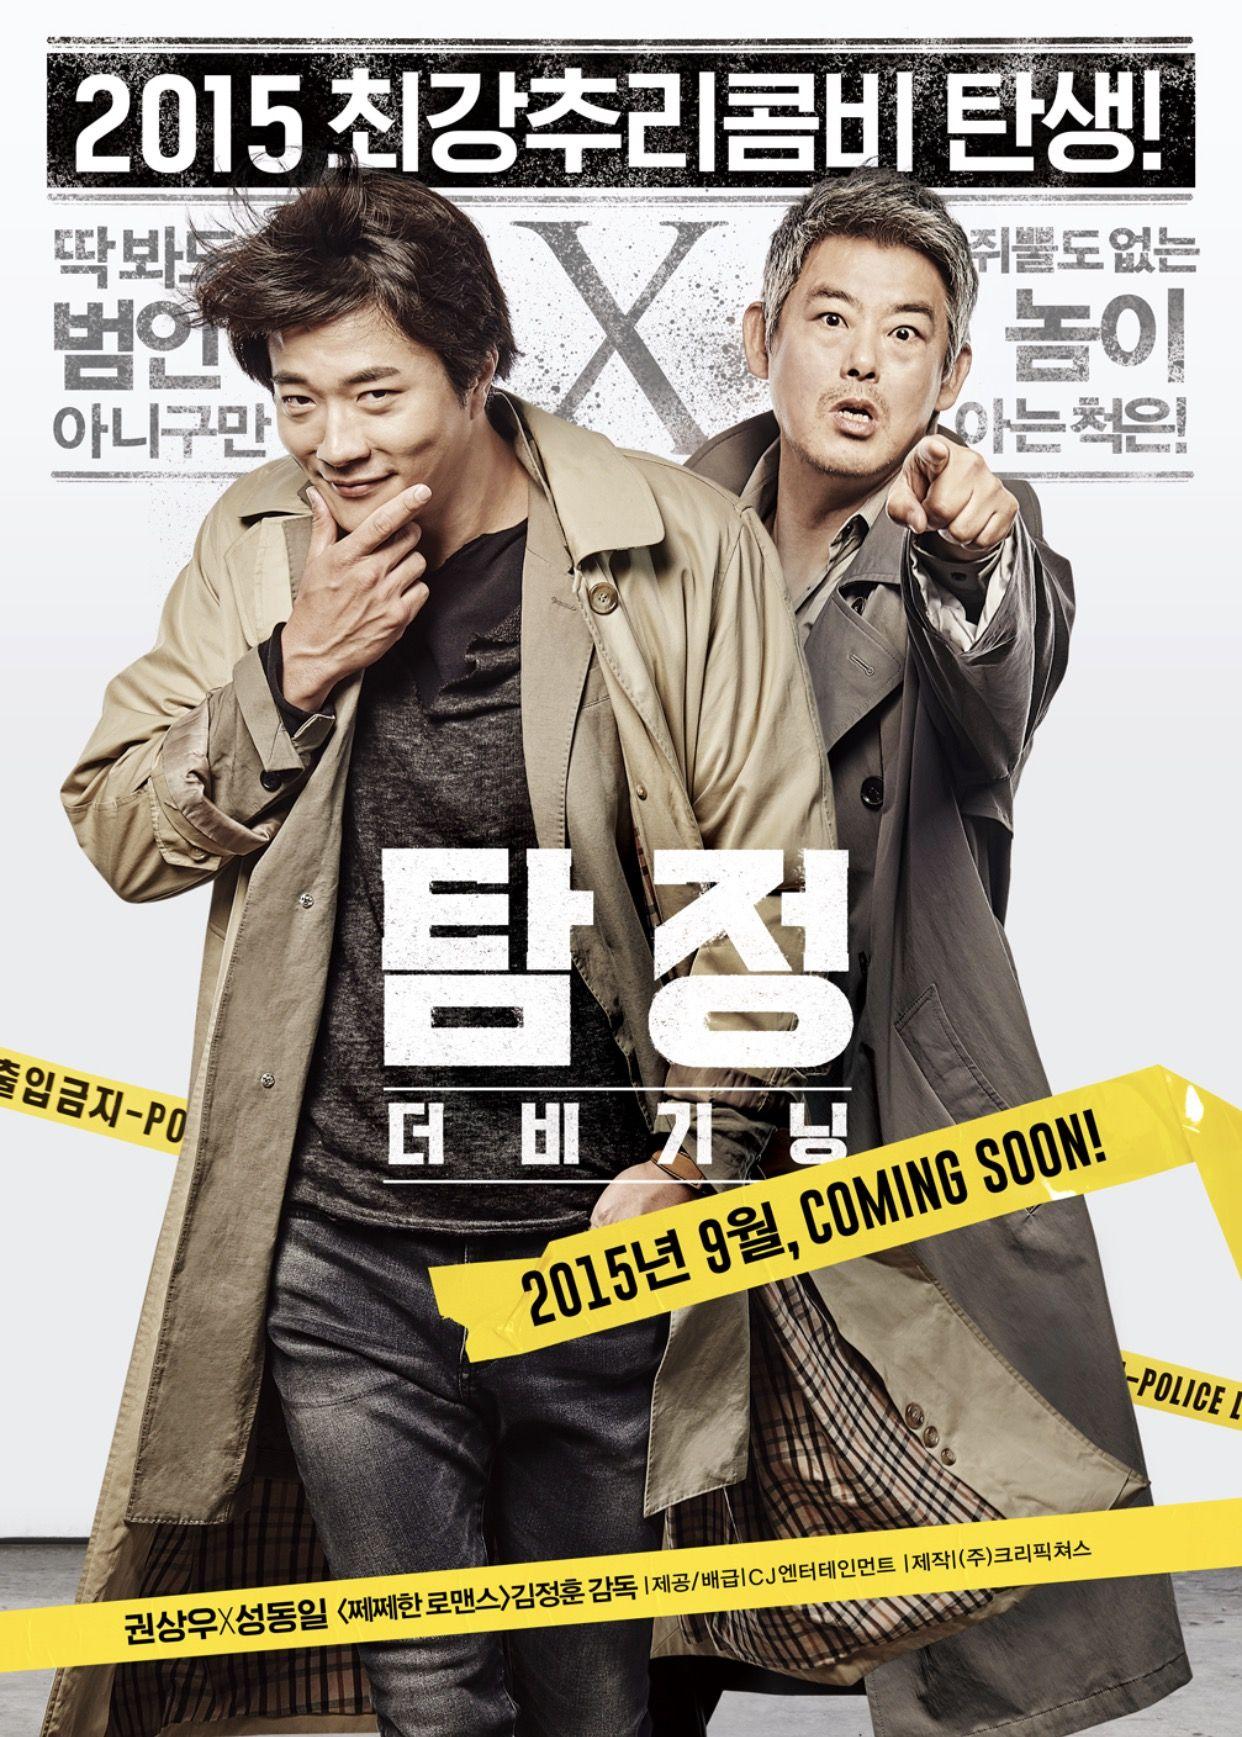 Film aksi komedi the accidental detective